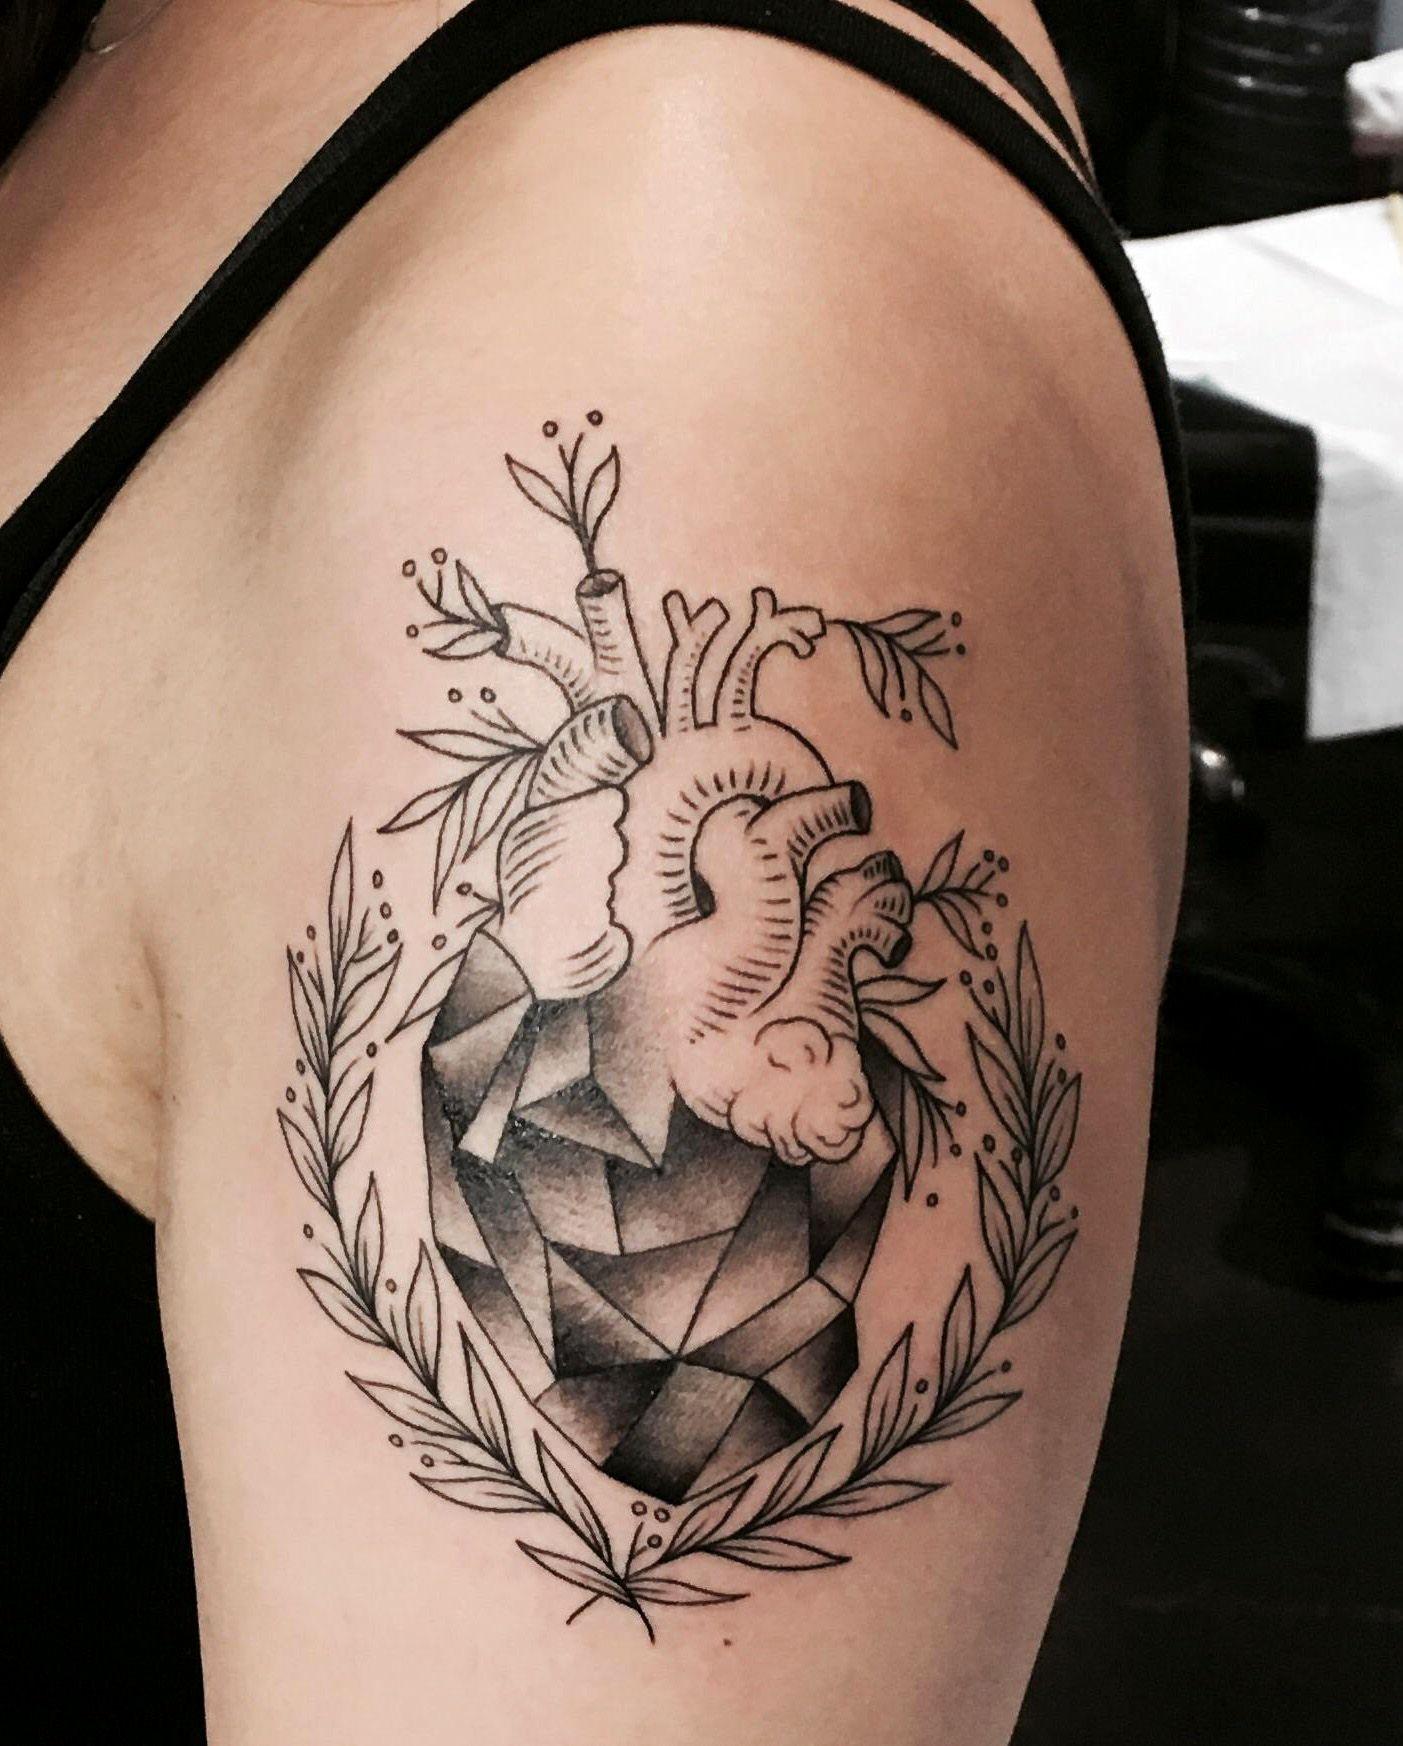 Geometric heart tattoo artist kass at adrenaline in